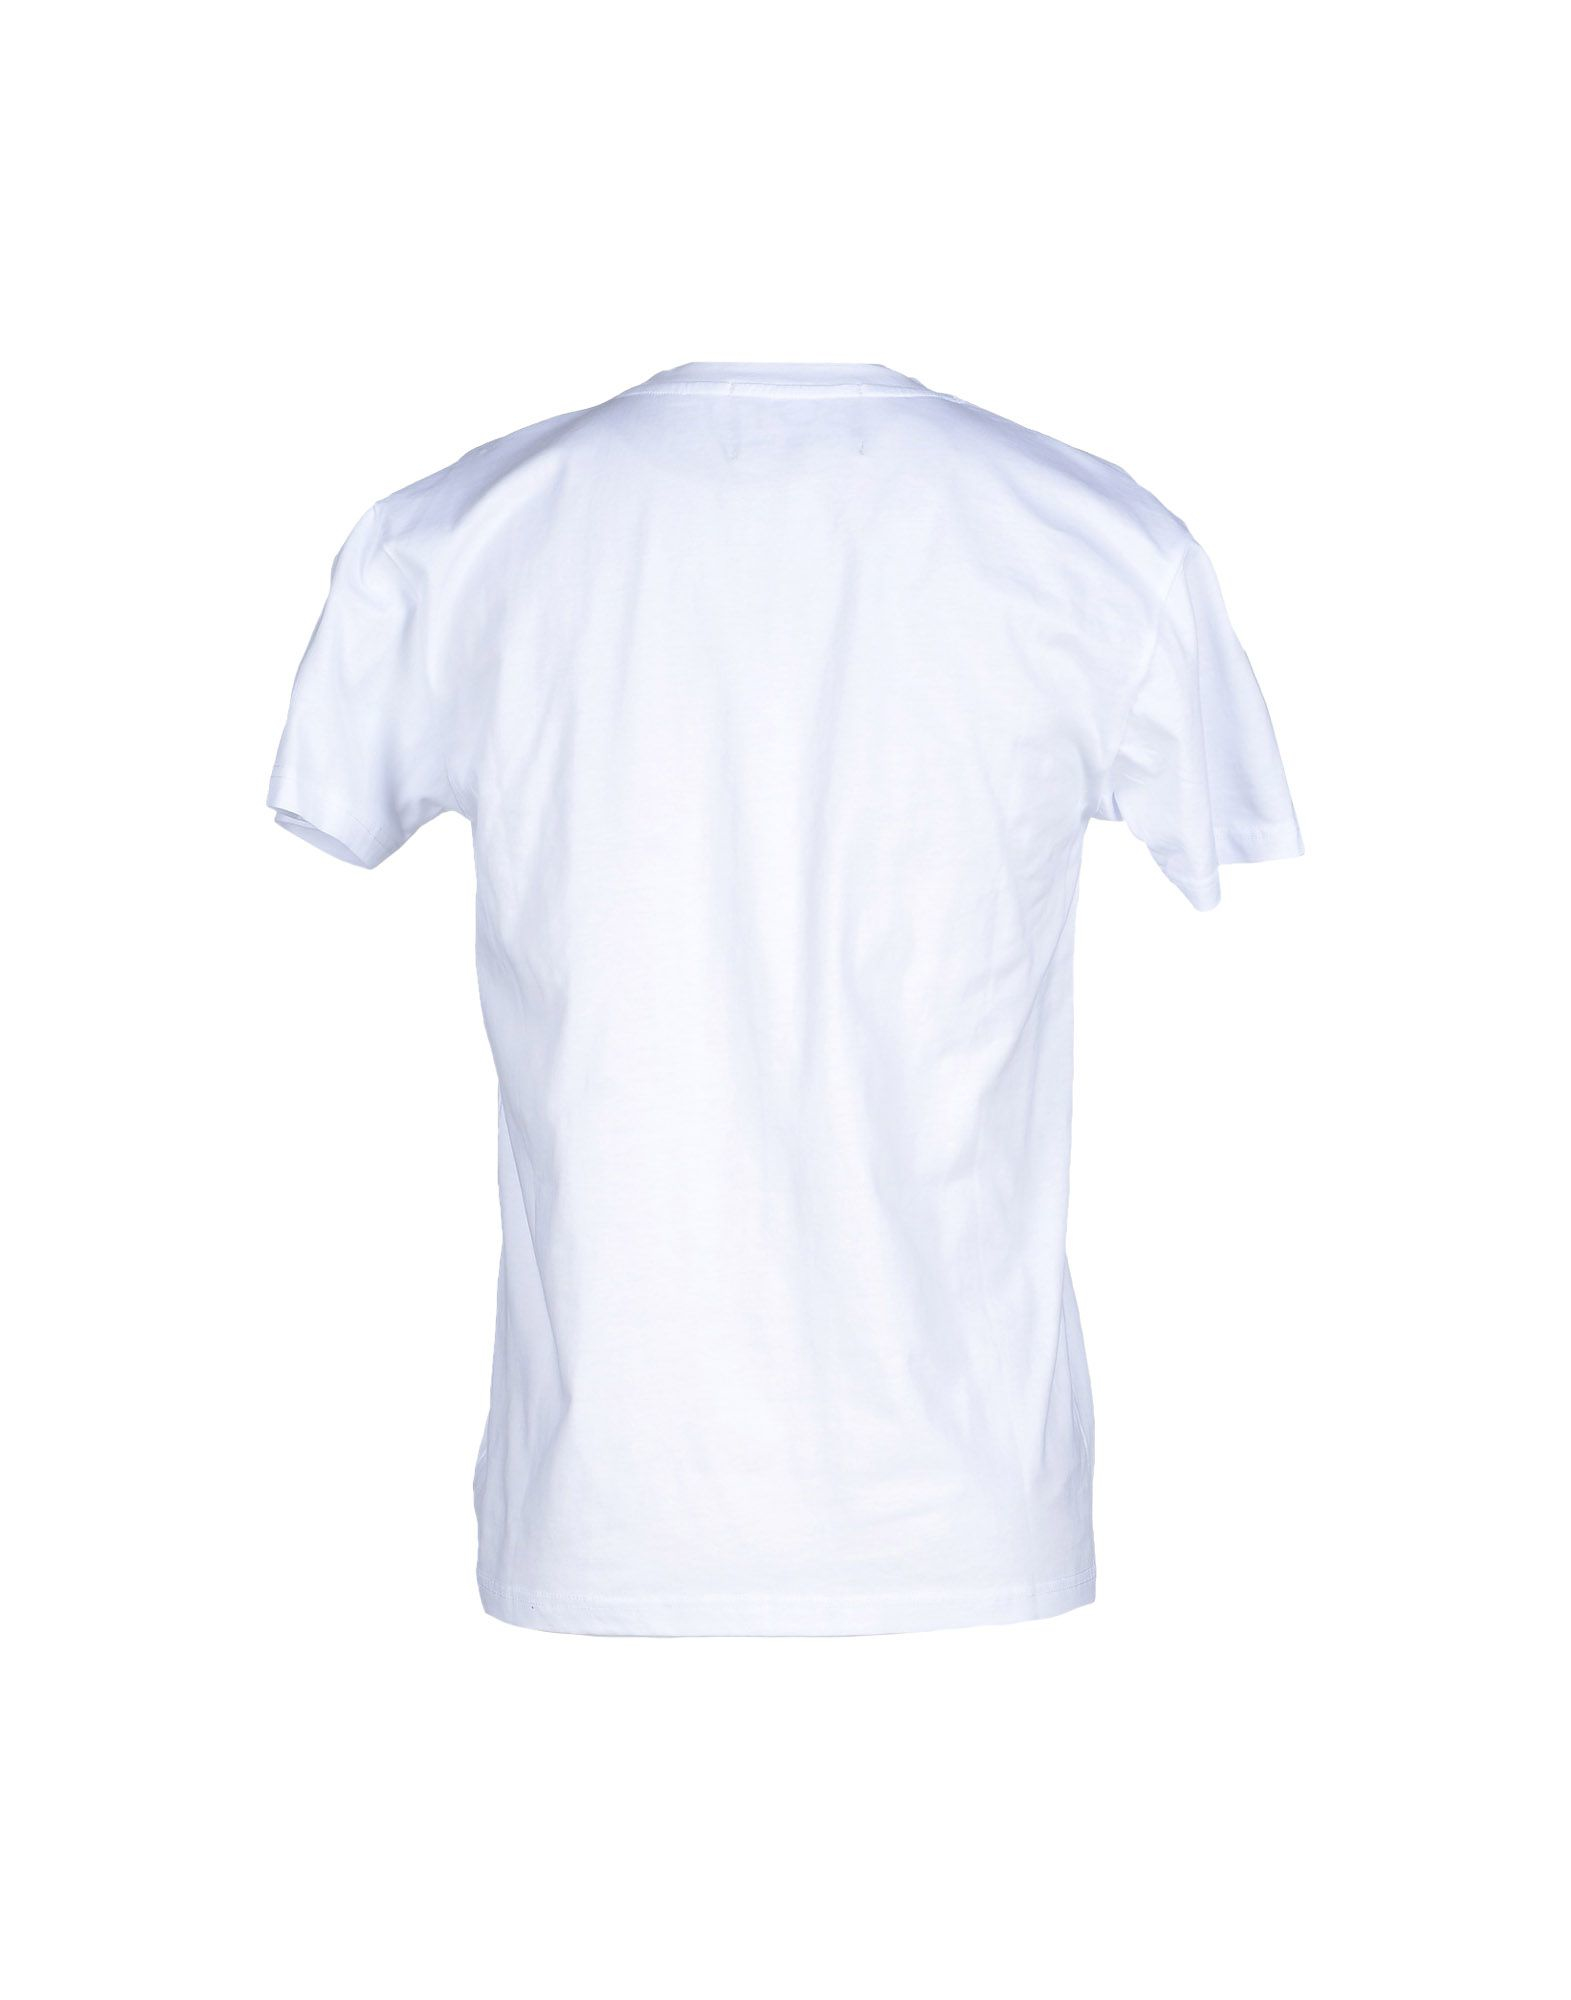 Lyst boy london t shirt in white for men Boy white t shirt